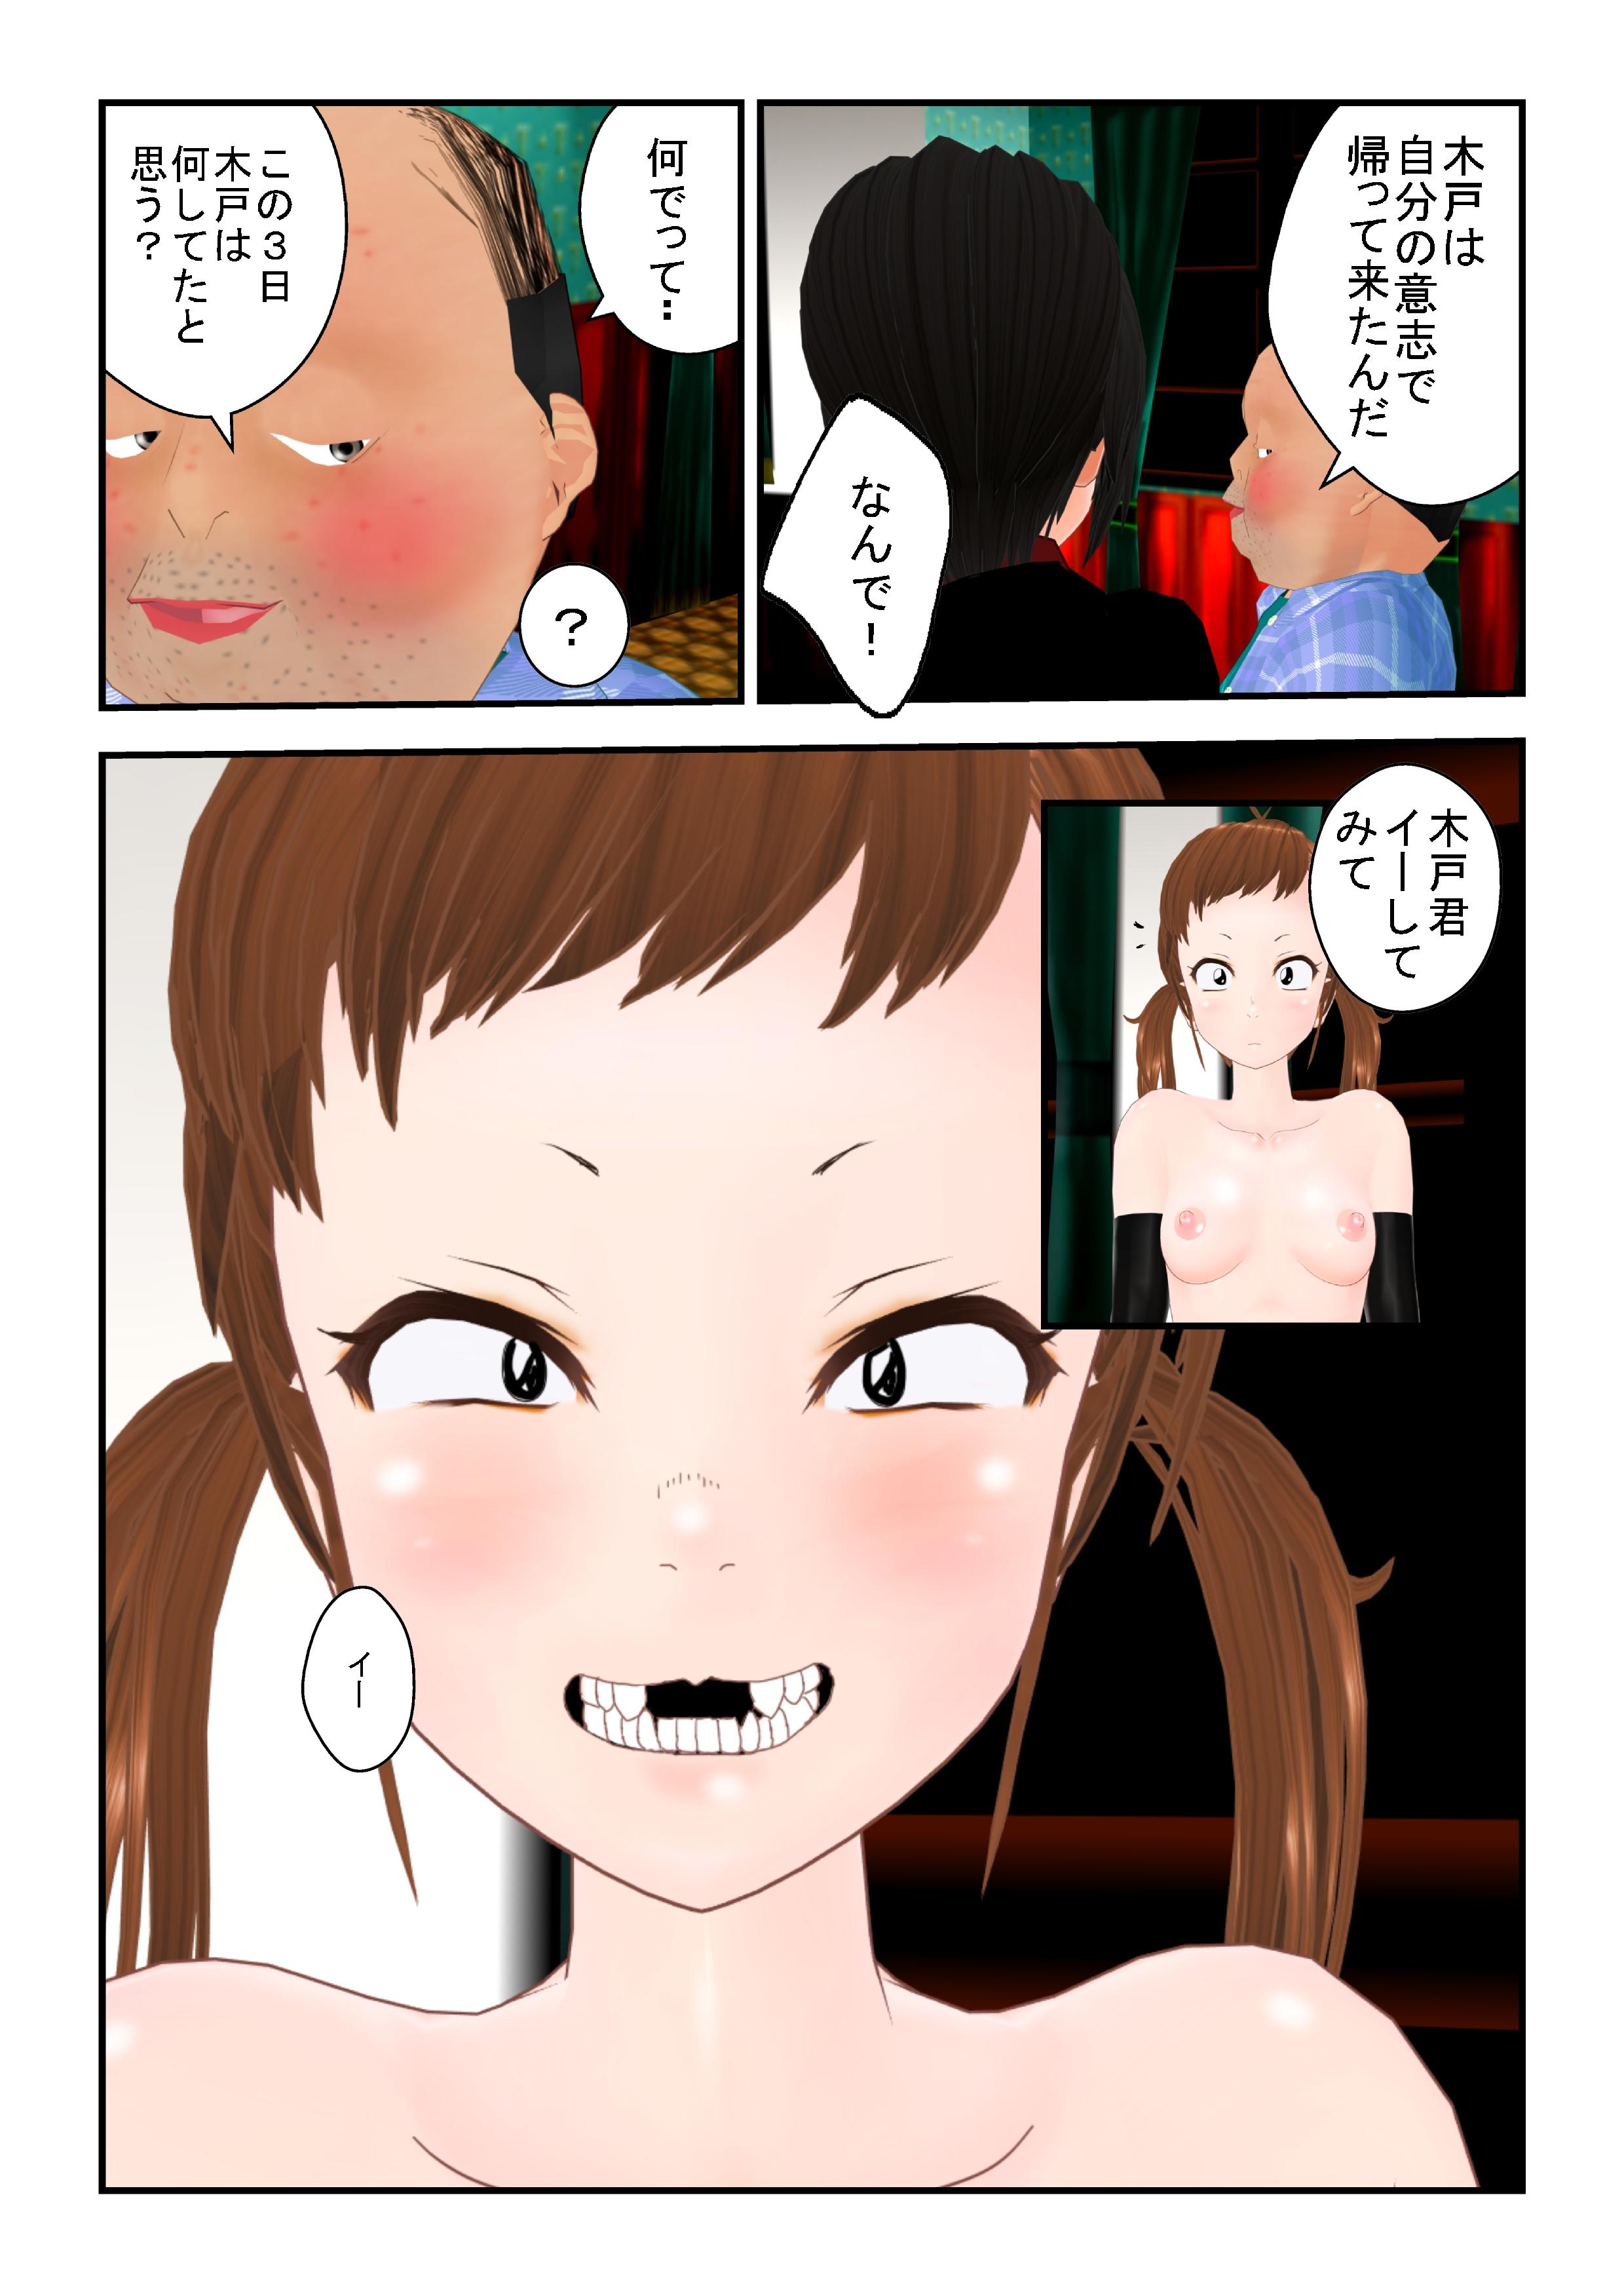 shi_0047.jpg